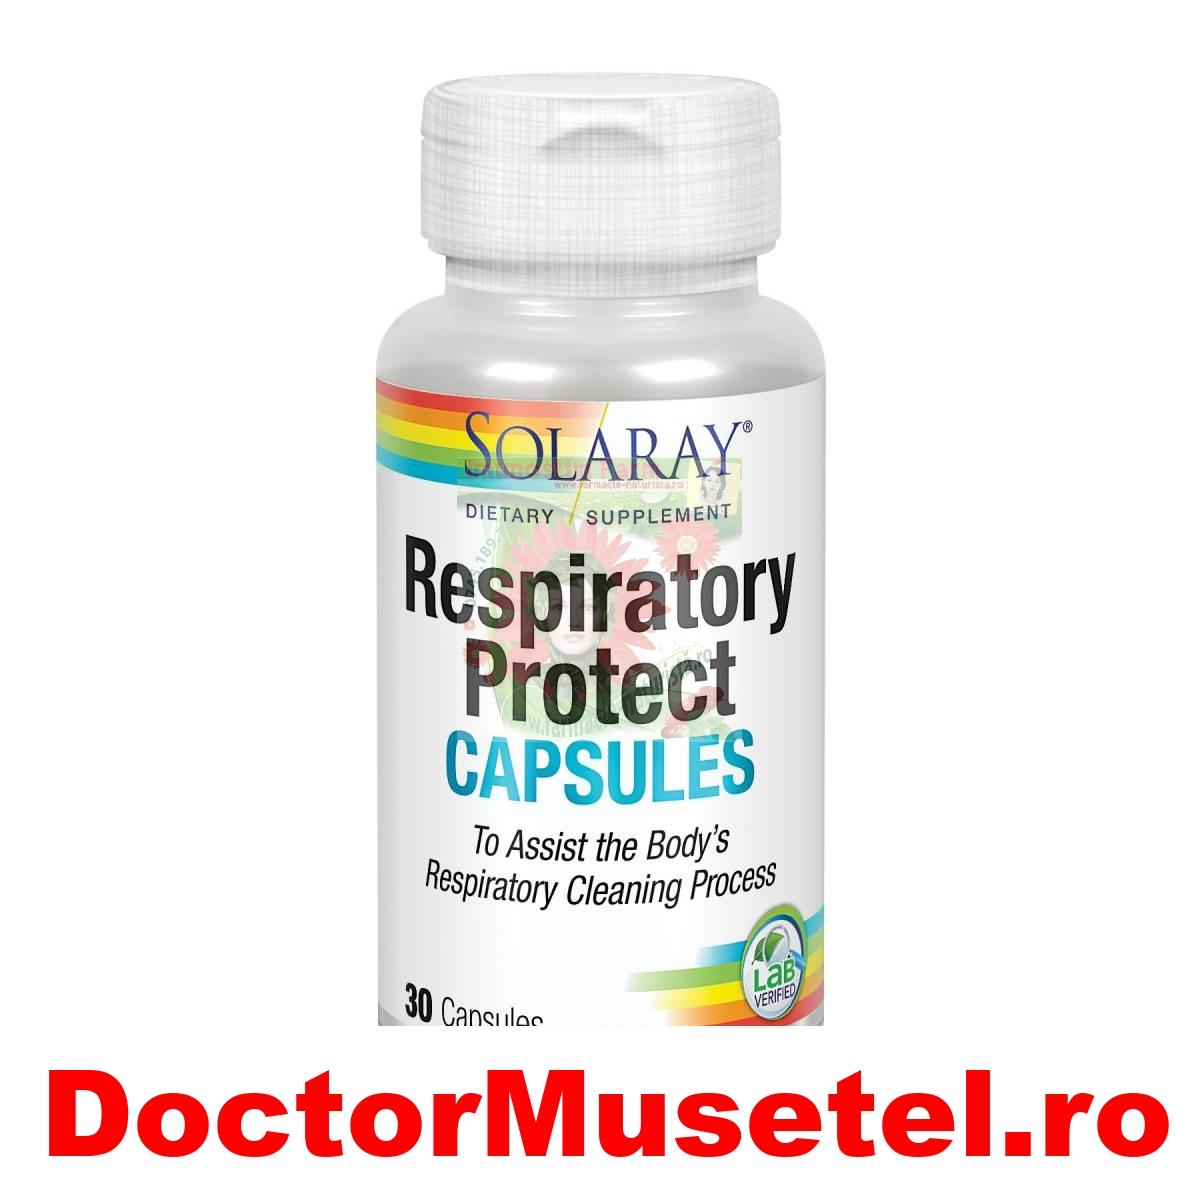 Respiratory-Protect--30-capsule--SOLARAY-PROTECT-35129.jpg